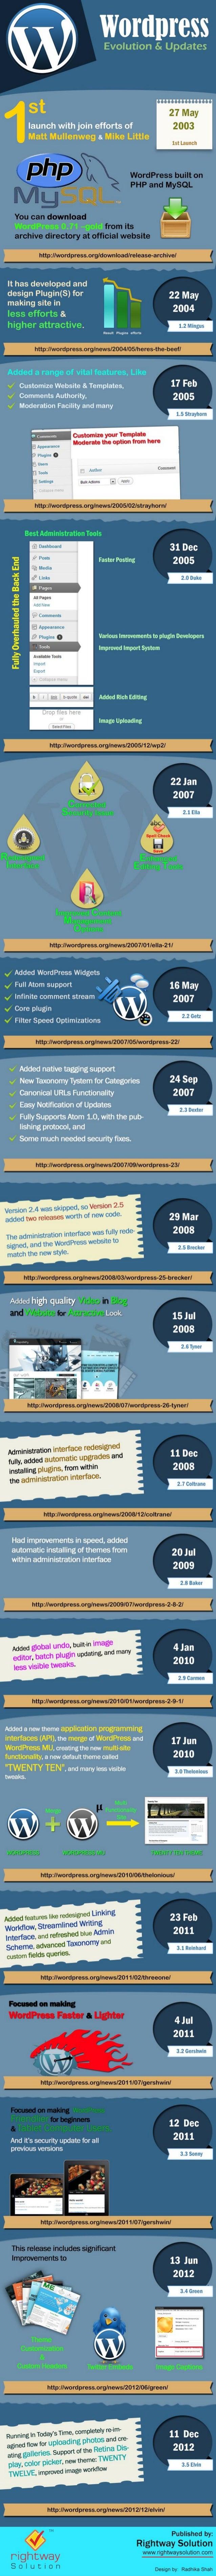 WordPress Development and It's Evolution